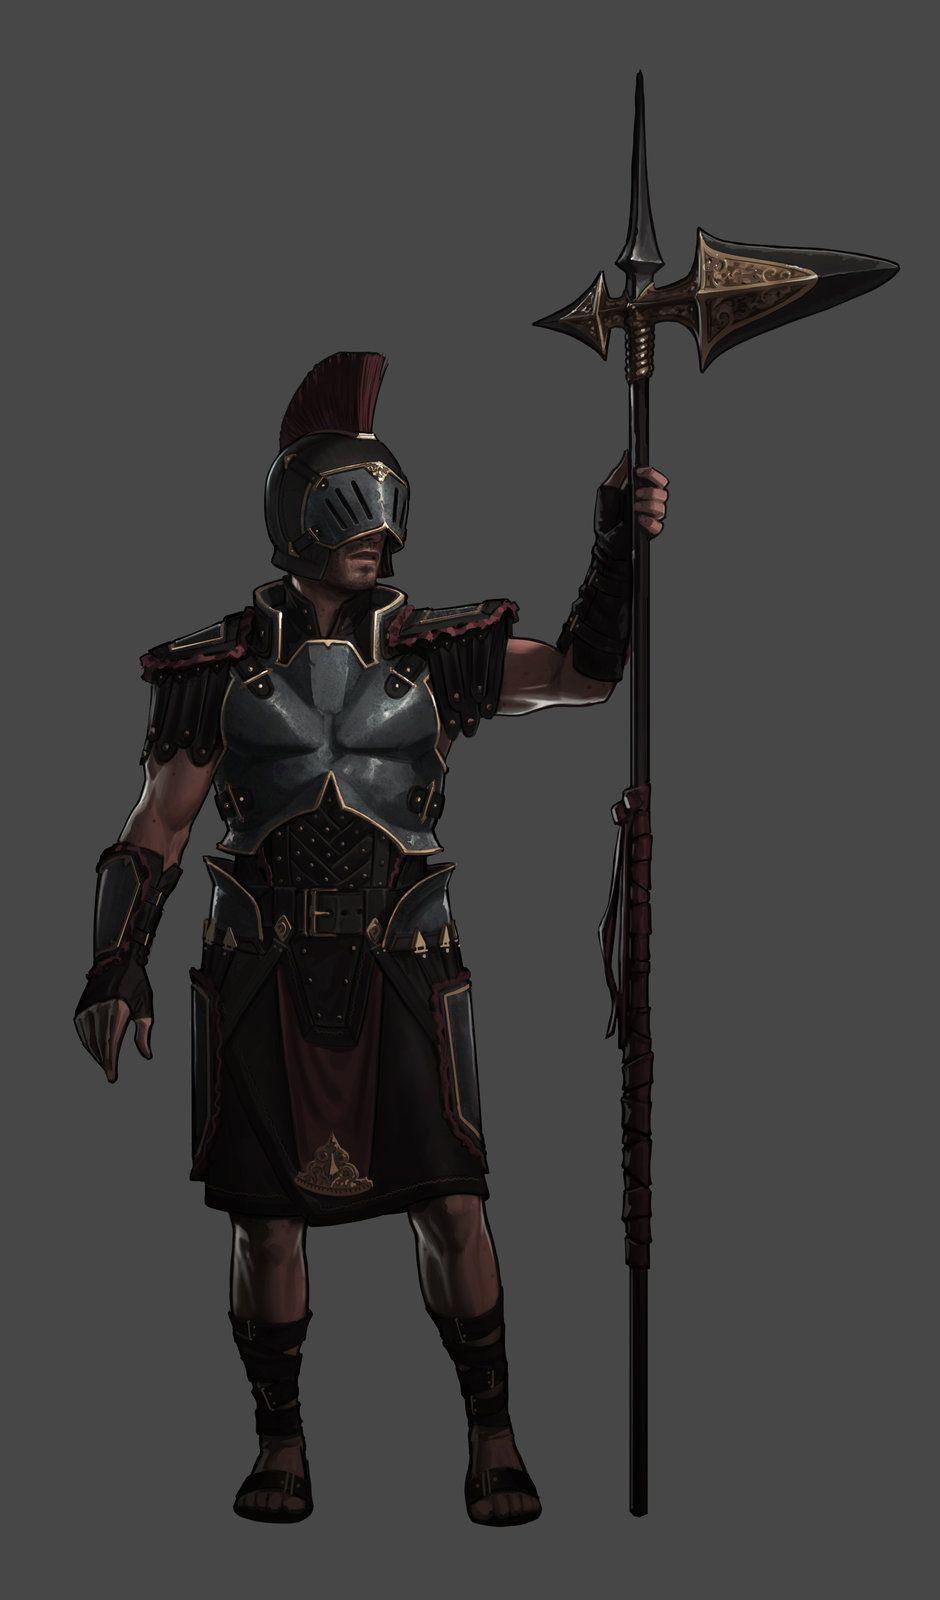 Guard, John Grello on ArtStation at https://www.artstation.com/artwork/guard-24c9154f-1f67-4460-af1c-fb42f5f1ae8a